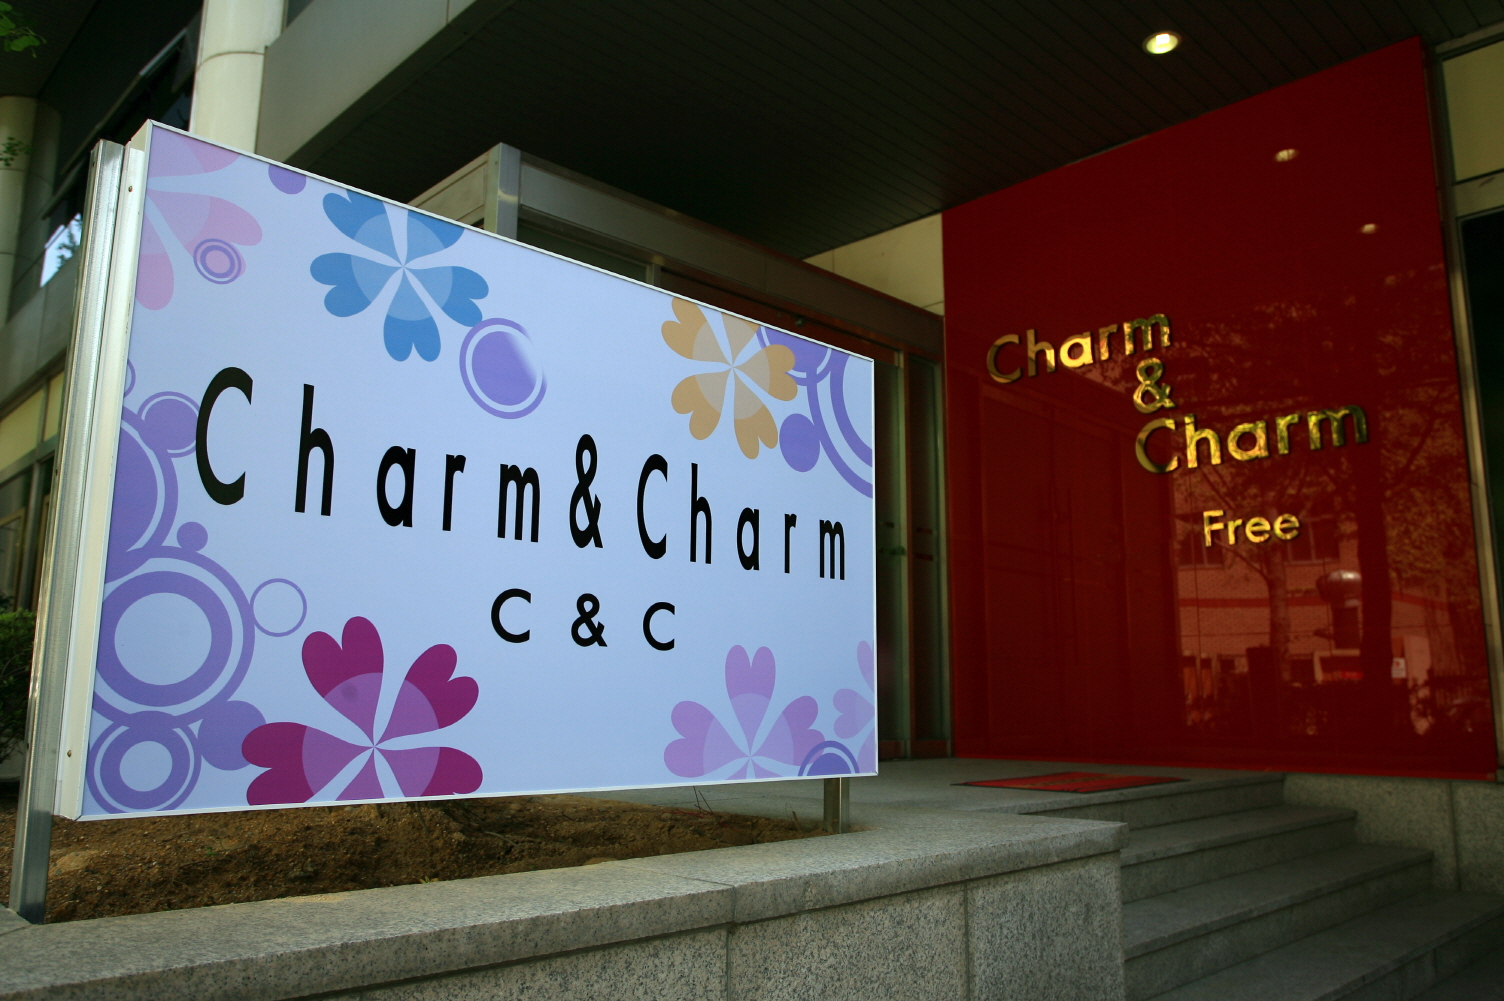 Charm & Charm釜山店 (참앤참 부산점)